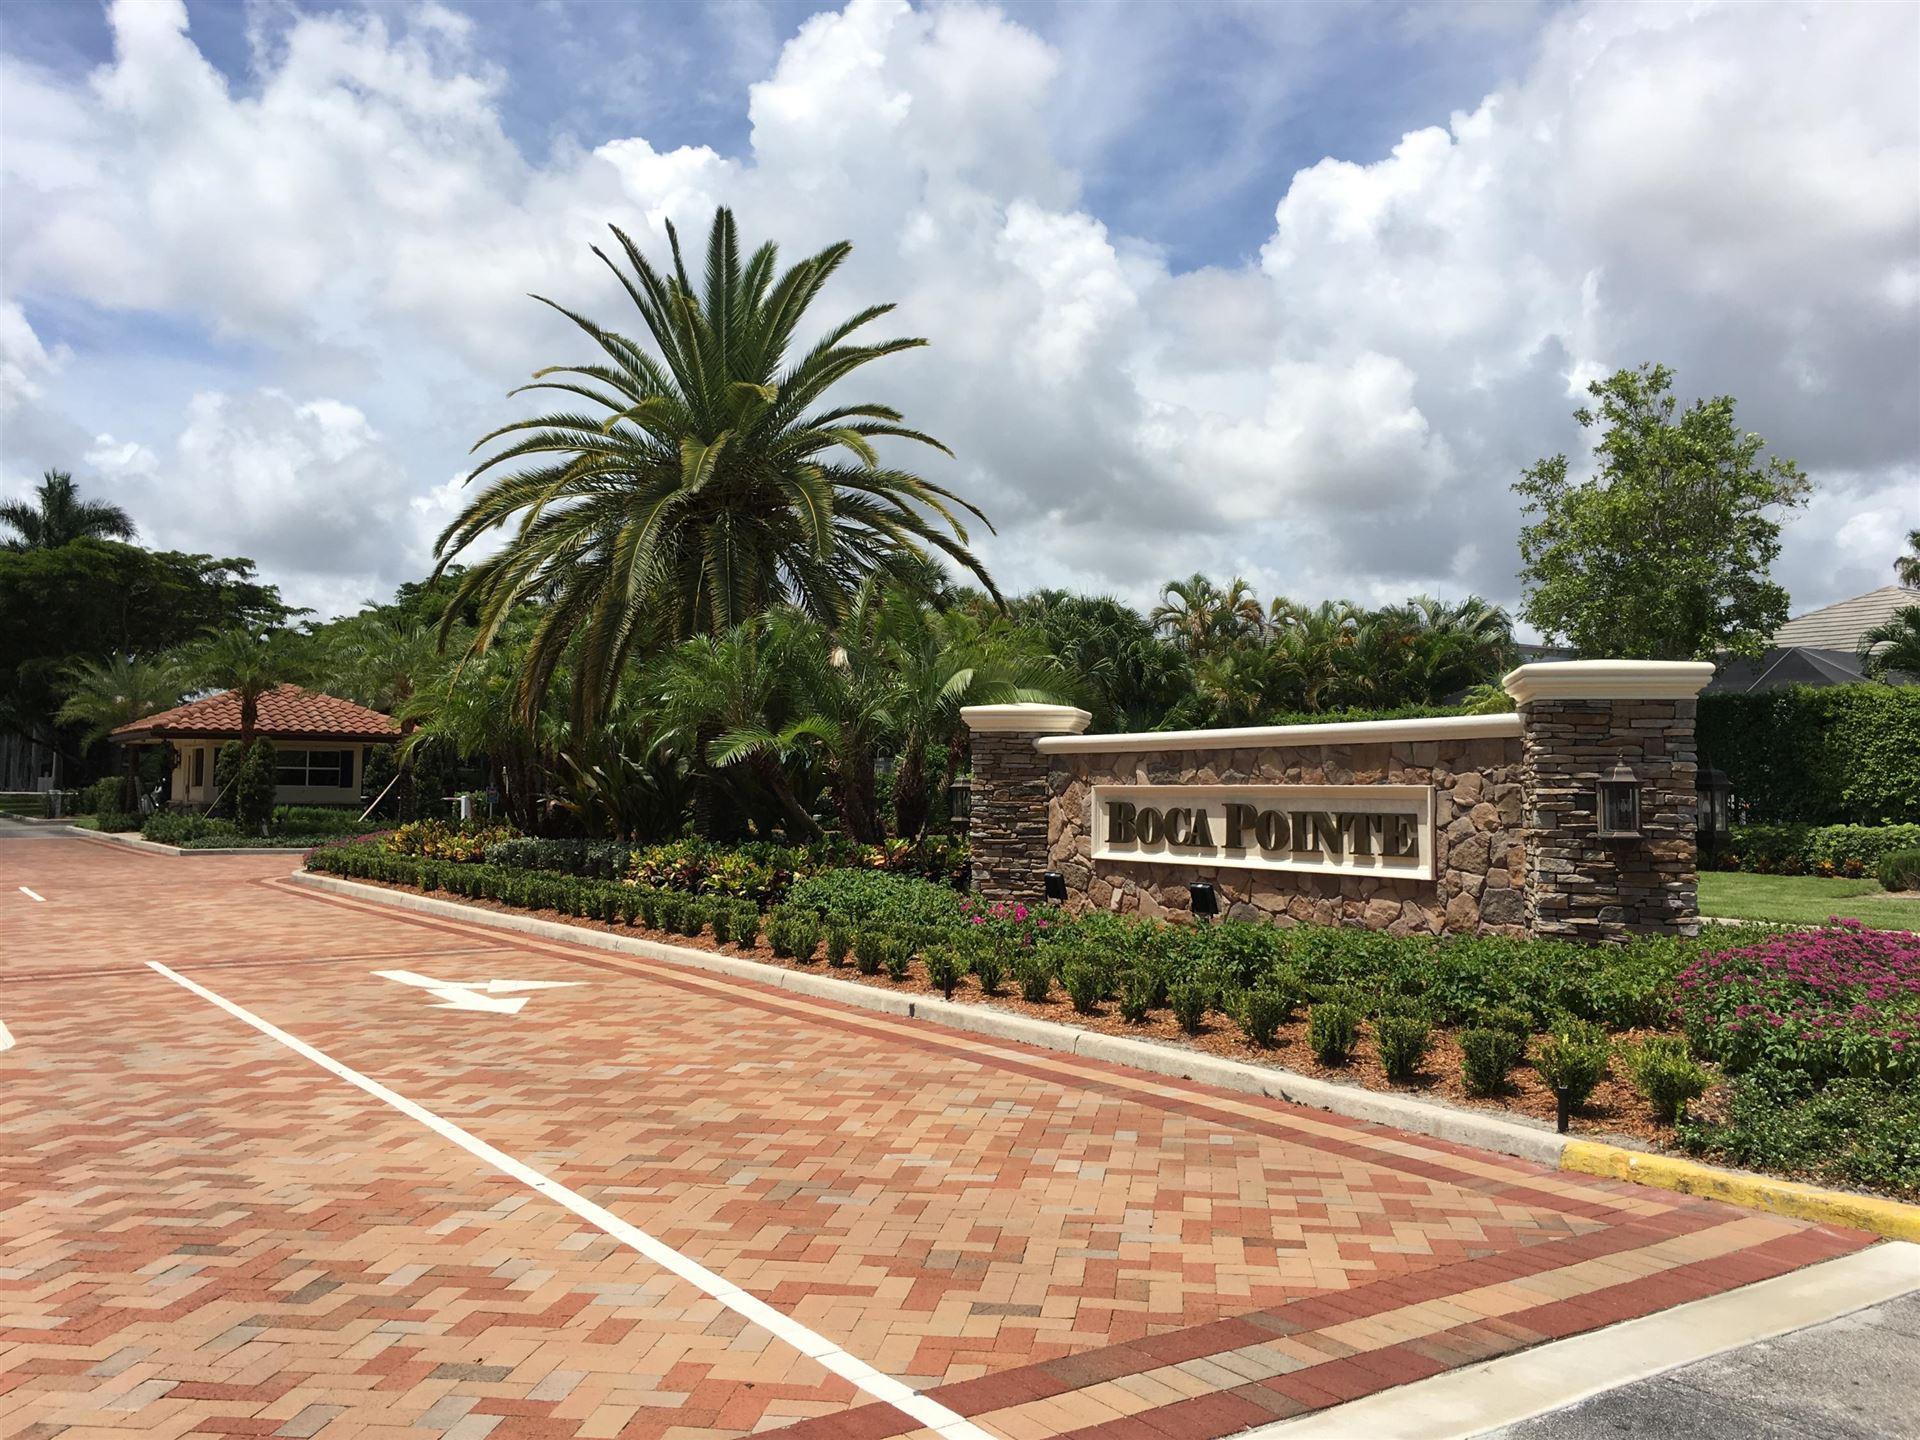 23321 Butterfly Palm Court, Boca Raton, FL 33433 - MLS#: RX-10739952